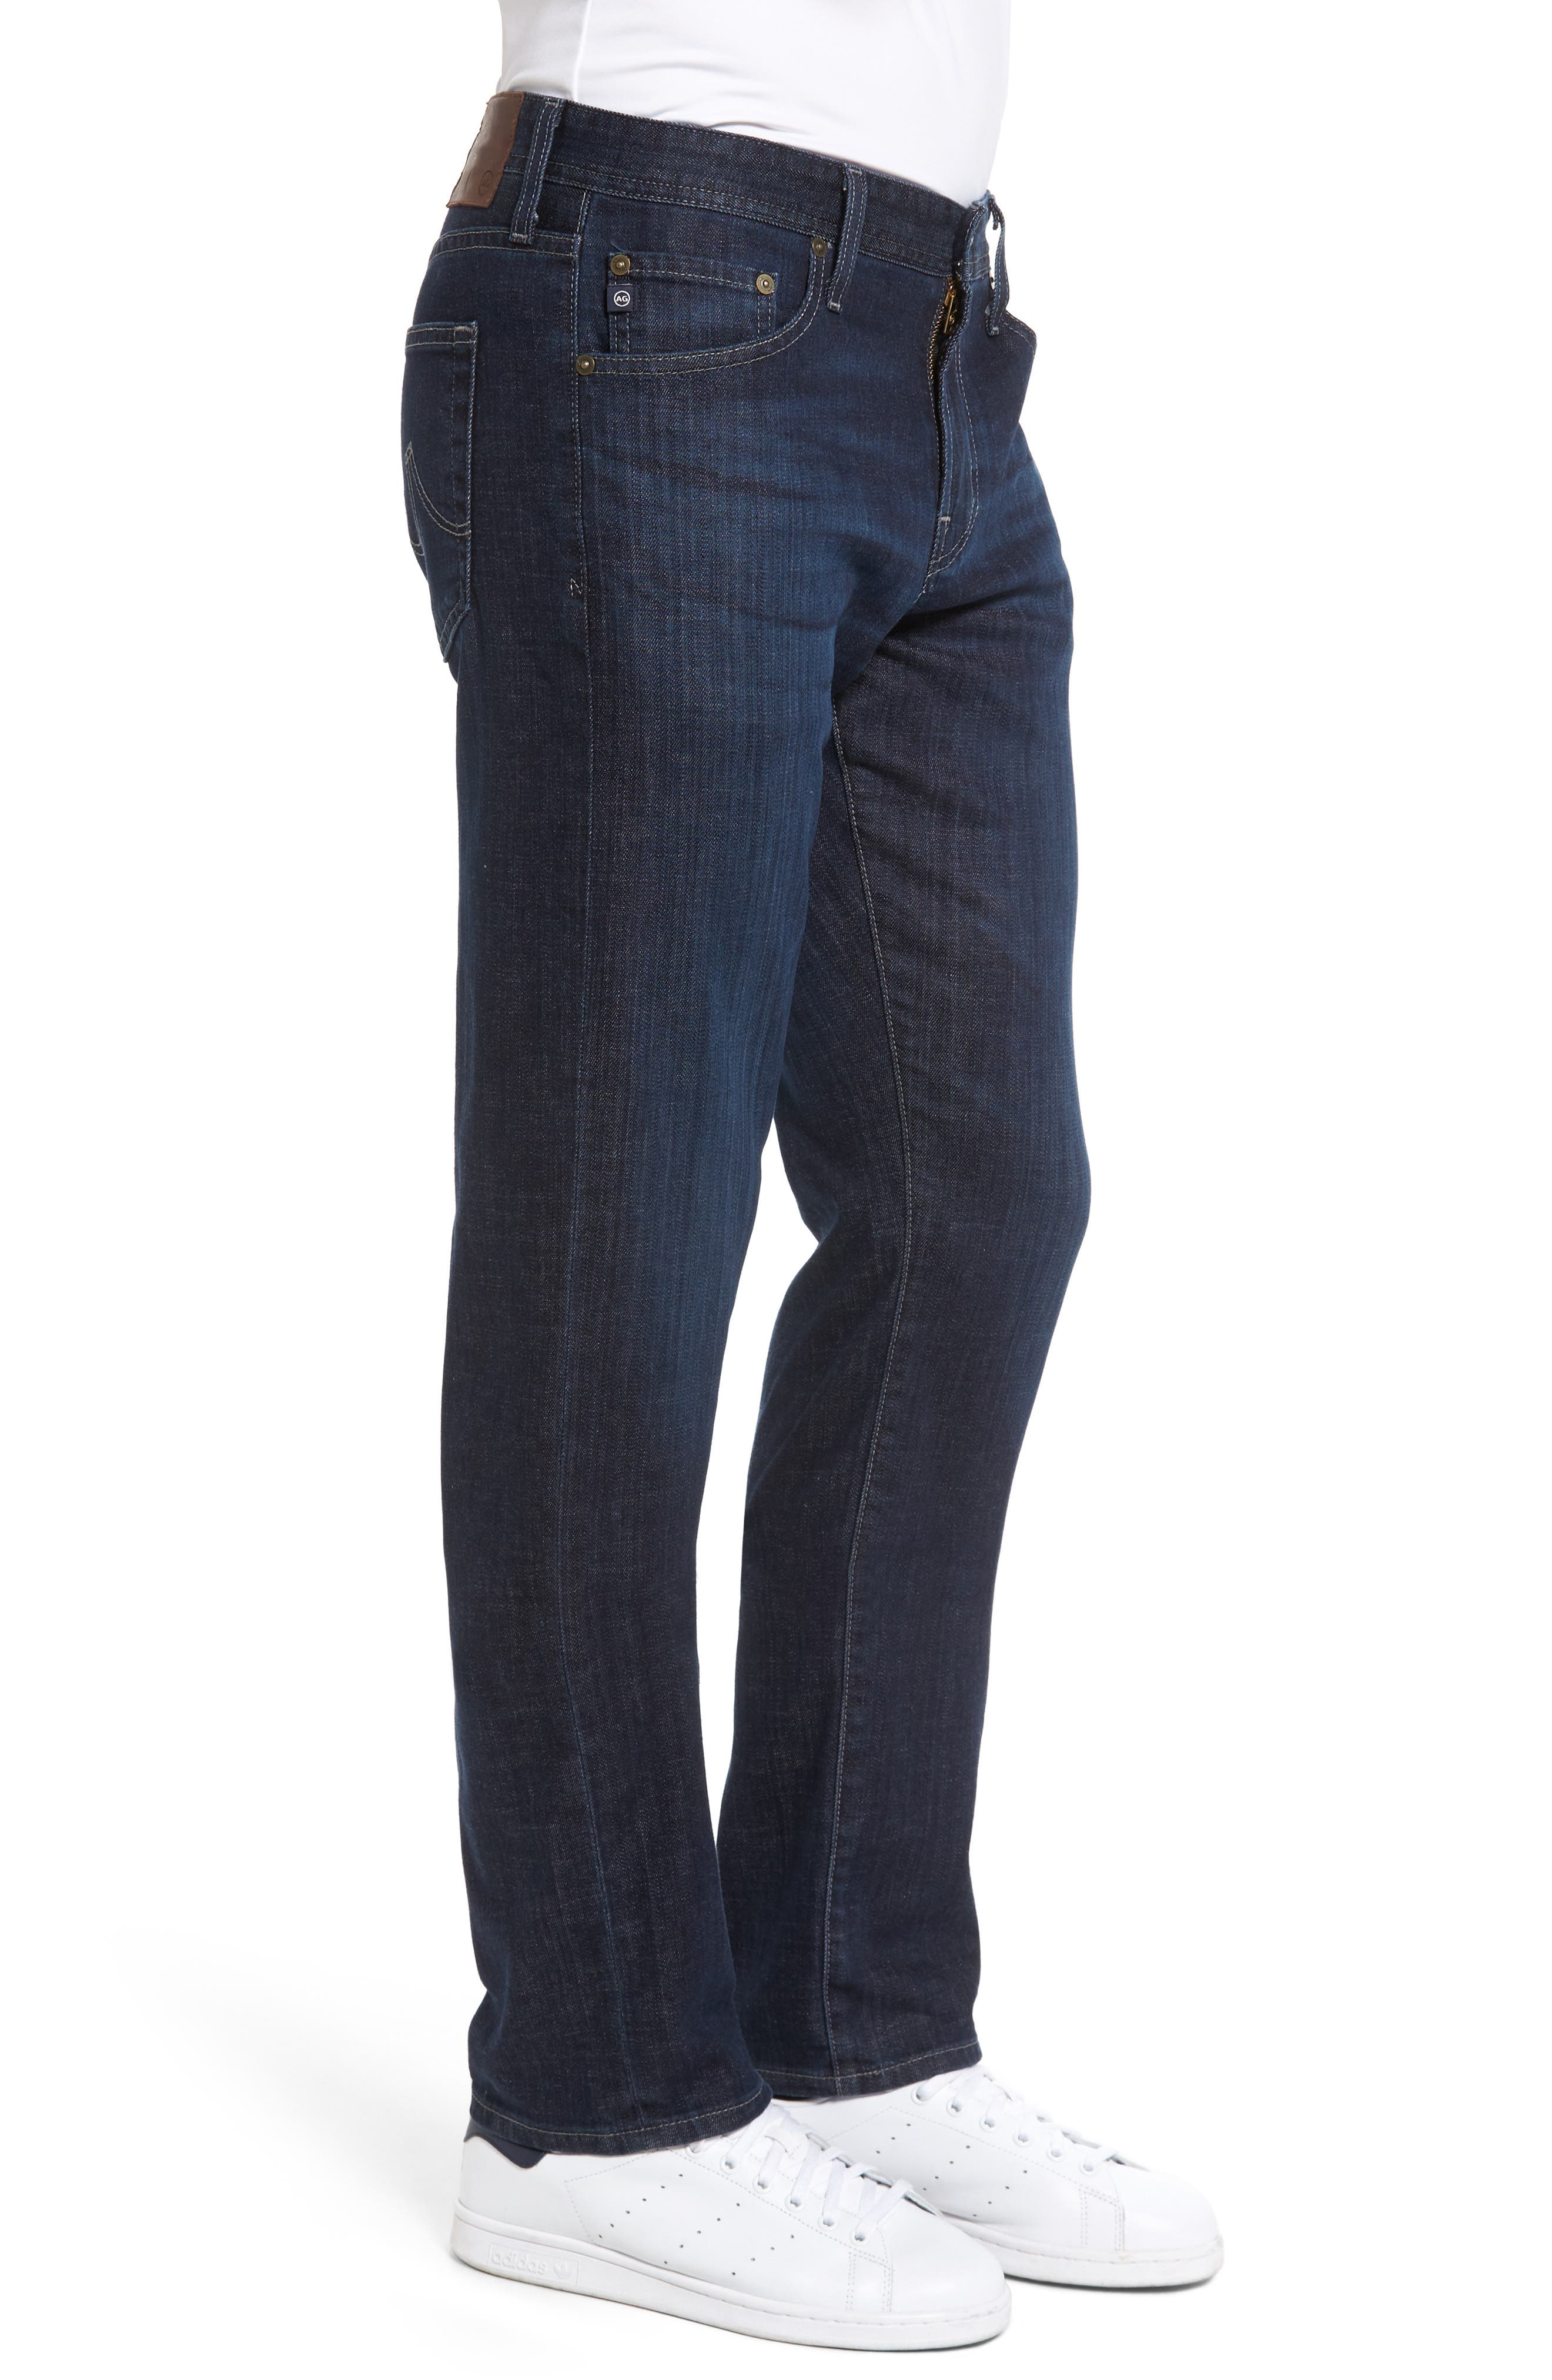 Graduate Slim Straight Leg Jeans,                             Alternate thumbnail 3, color,                             472